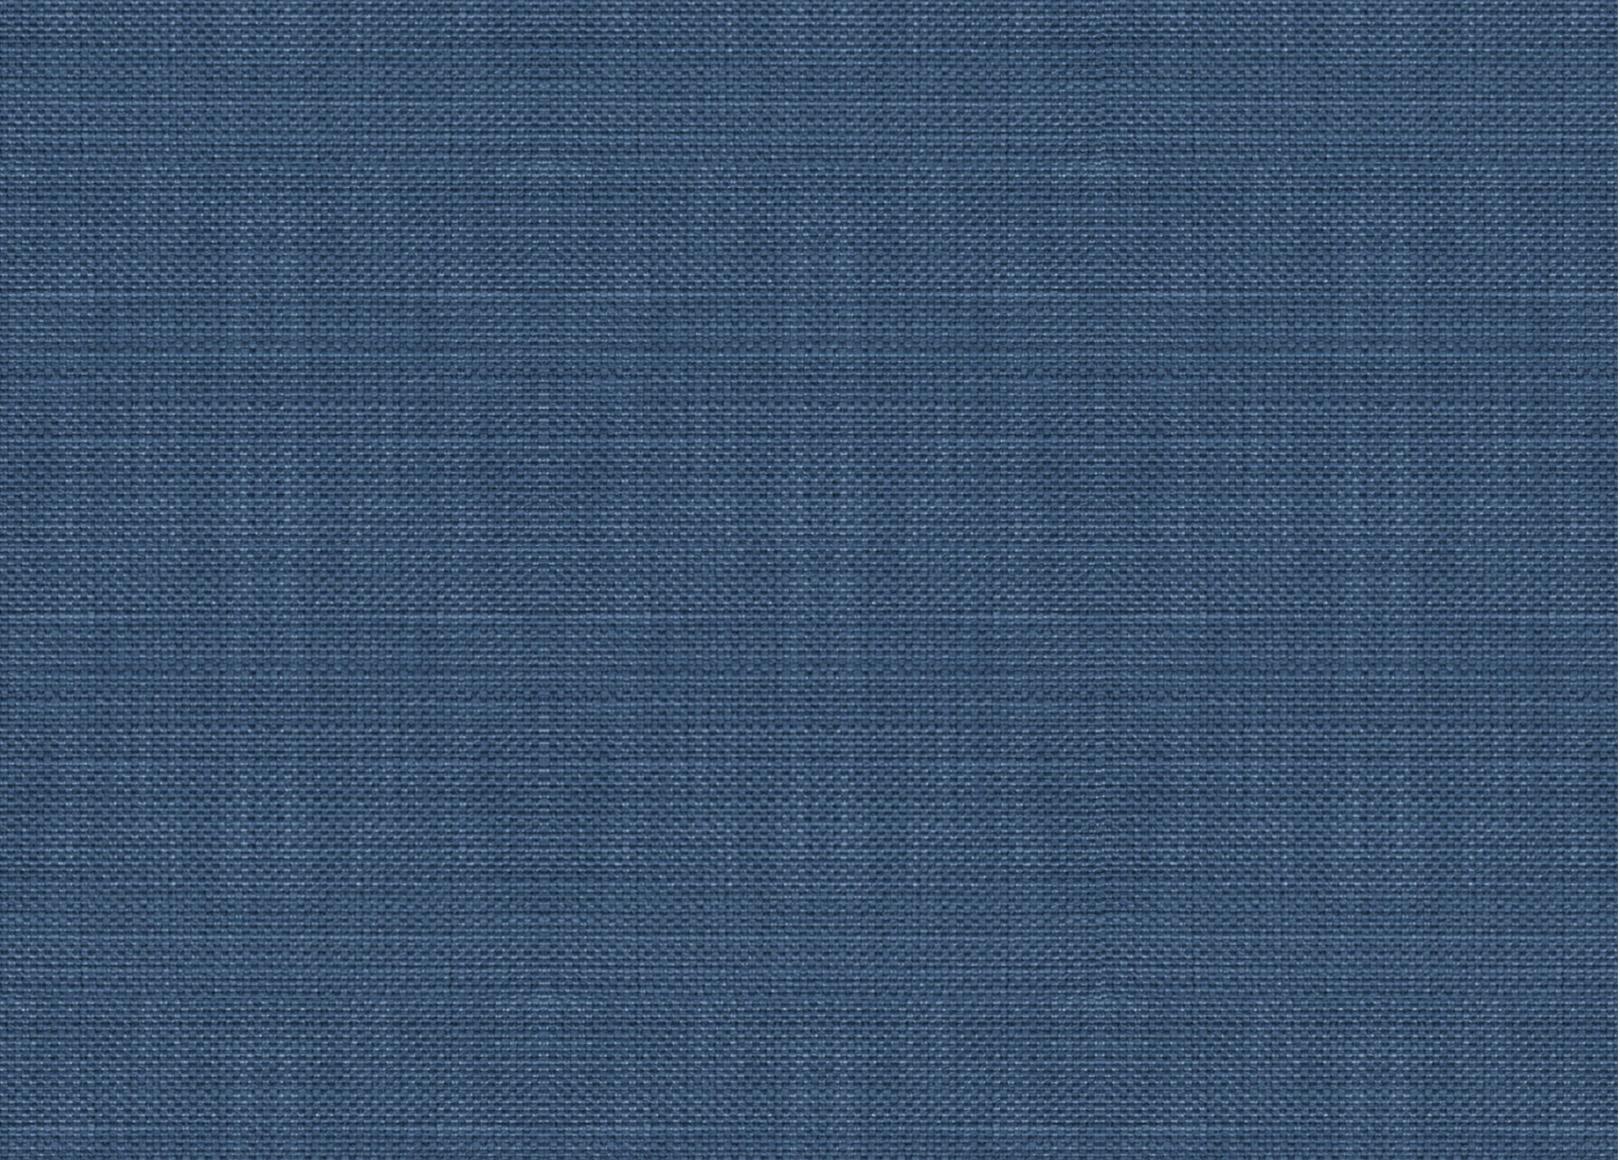 Springer Chambray Fabric Fabrics Ethan Allen